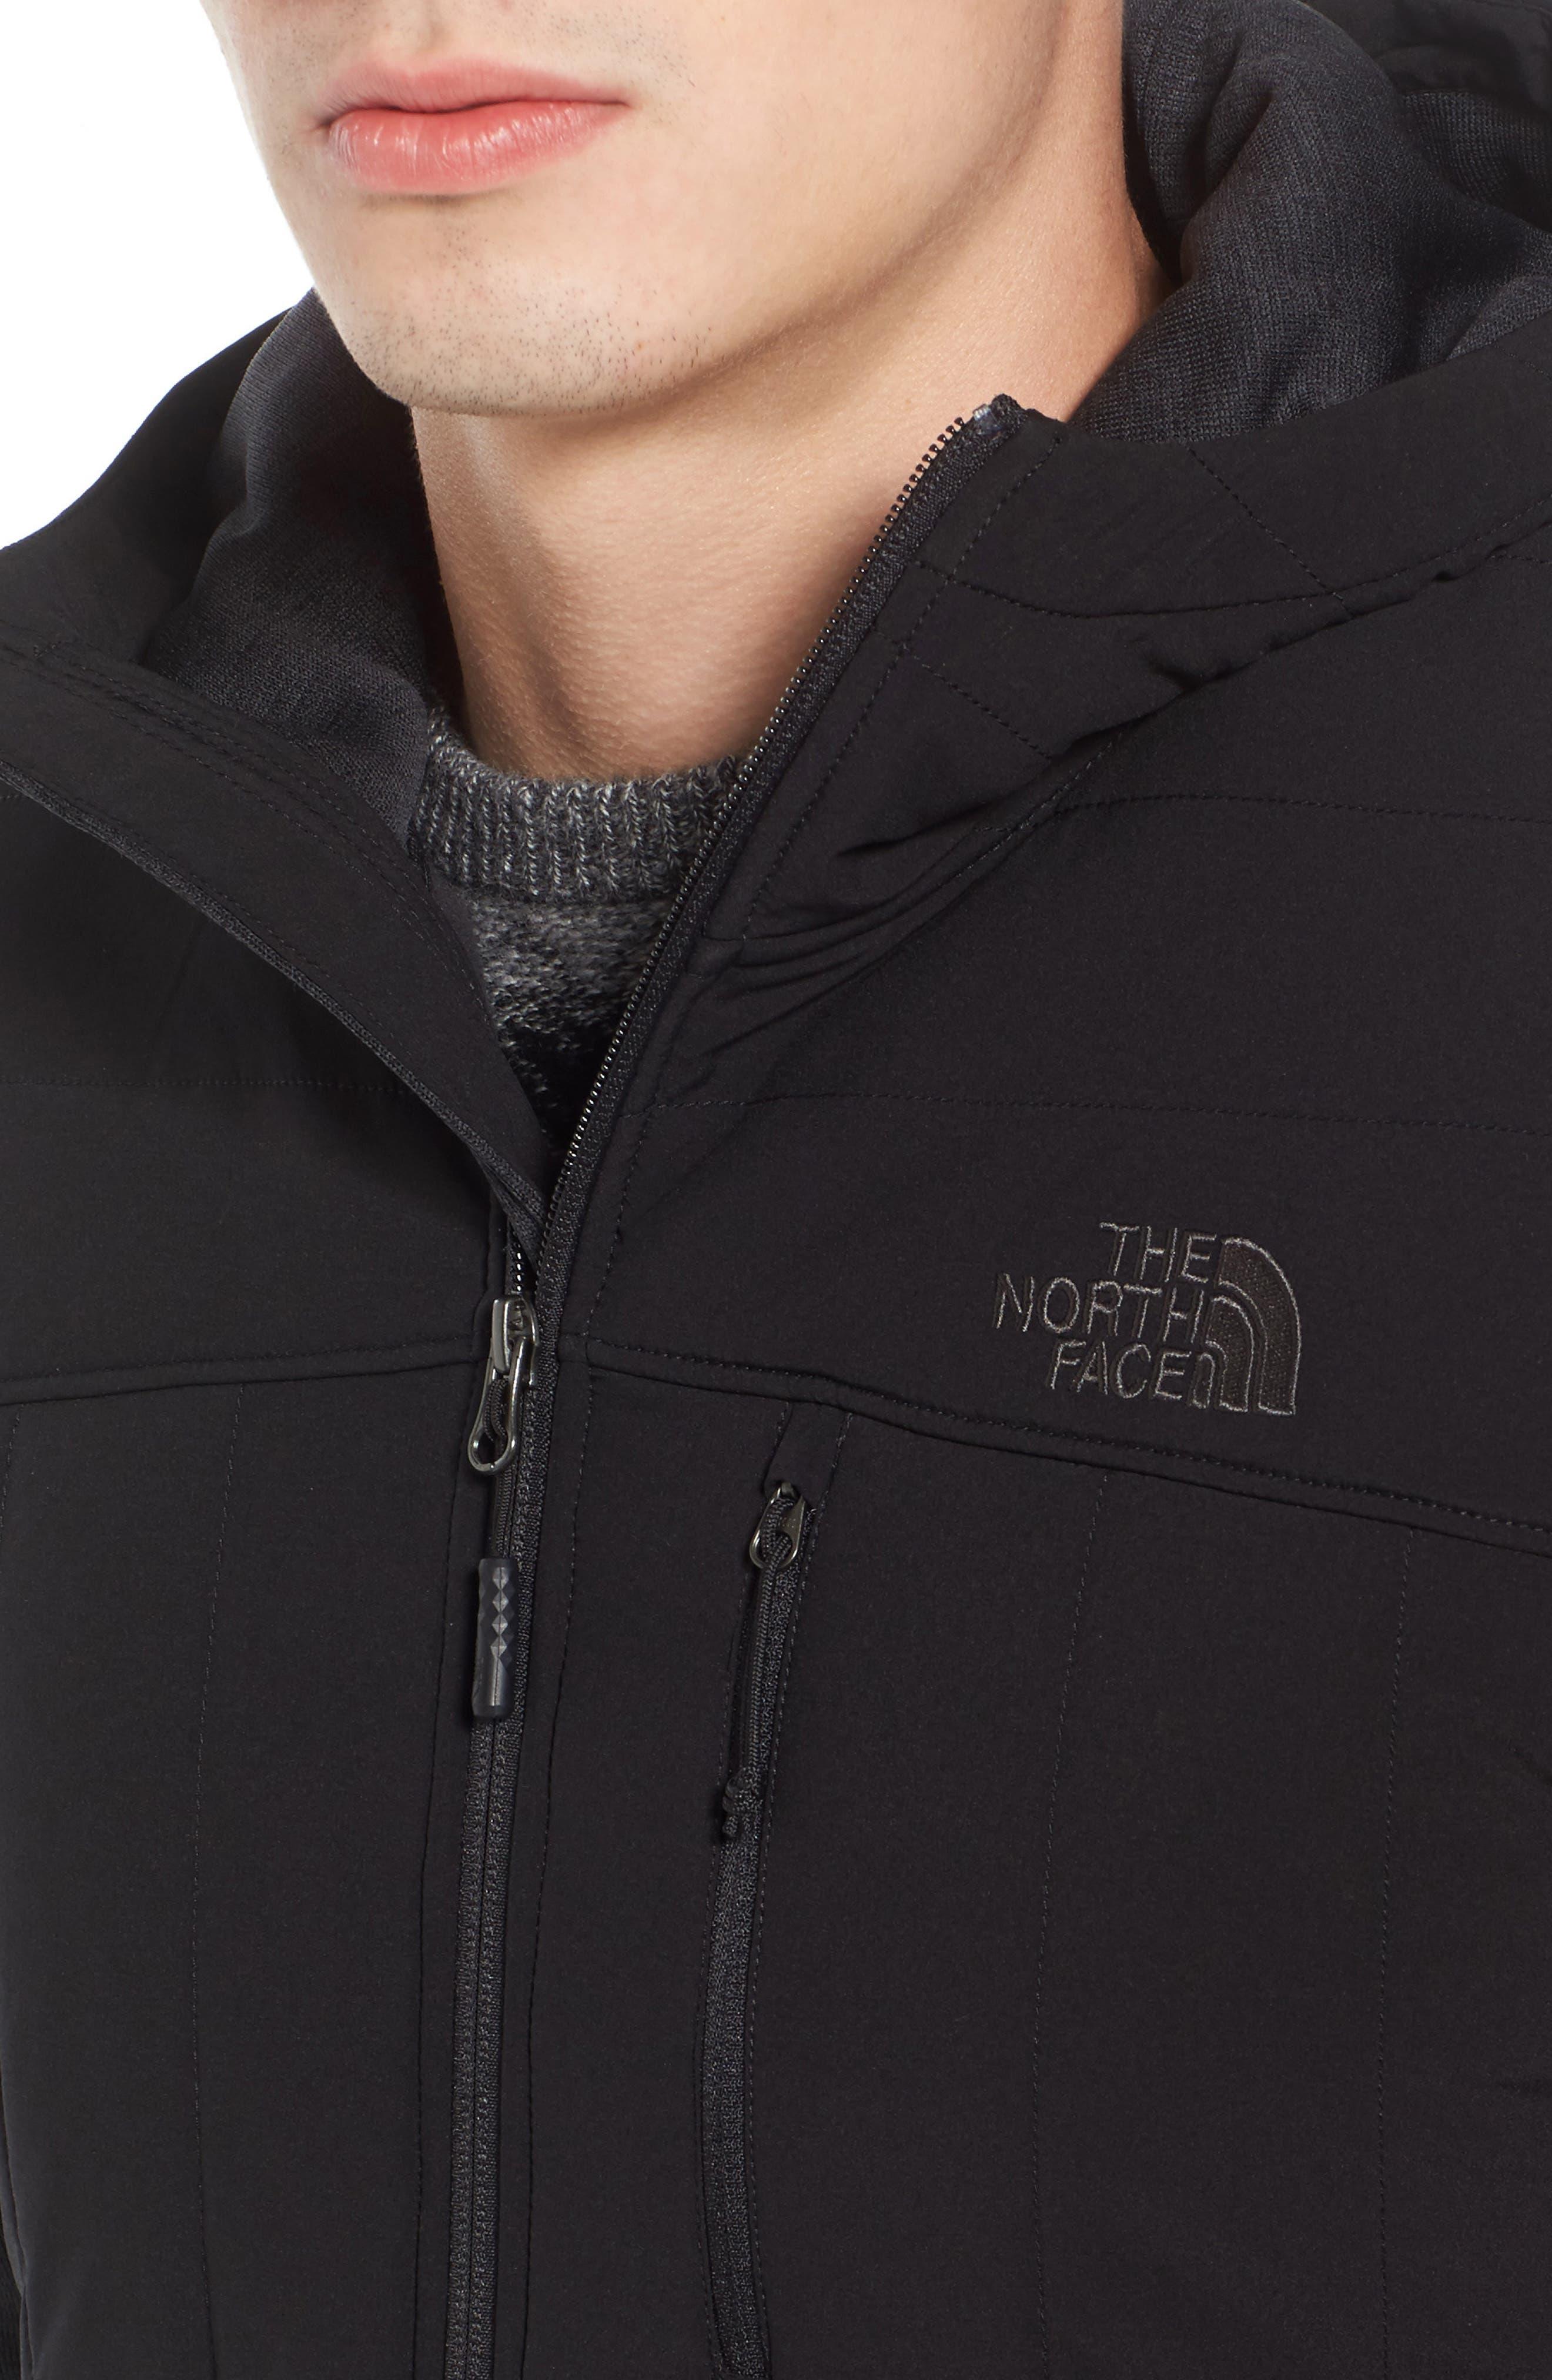 Norris Insulated Fleece Jacket,                             Alternate thumbnail 4, color,